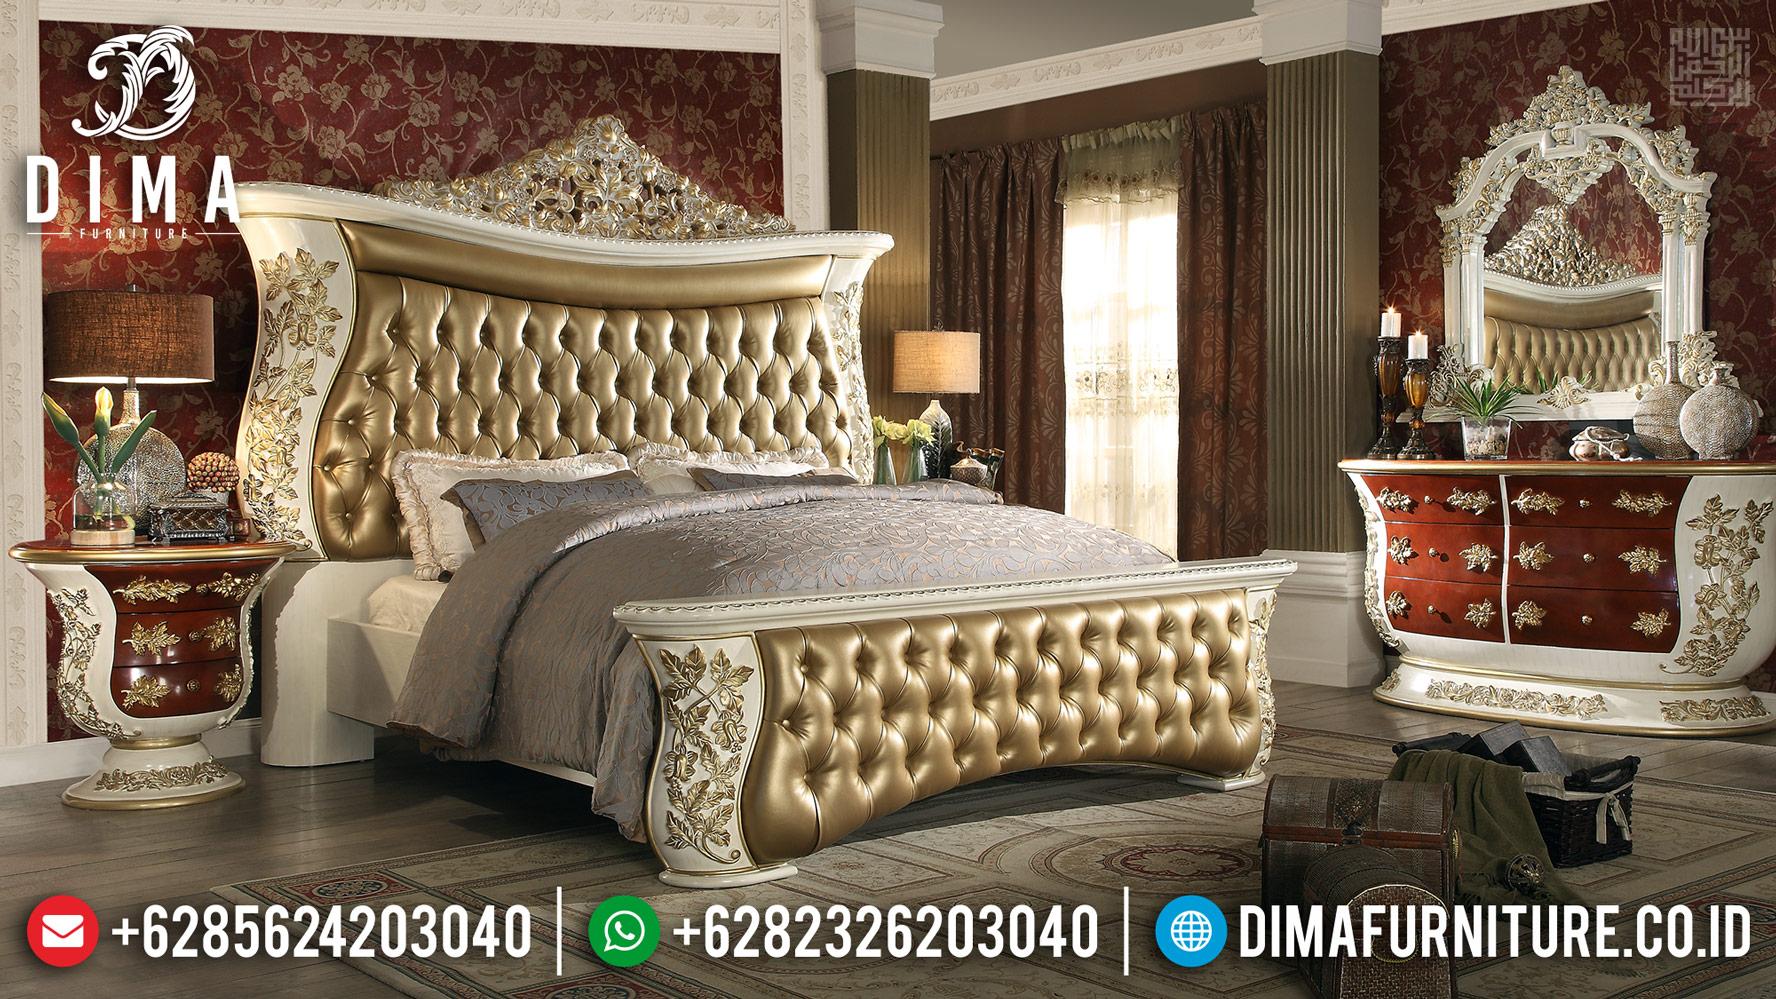 New Tempat Tidur Mewah Romanian Luxury Carving Duco TTJ-0418